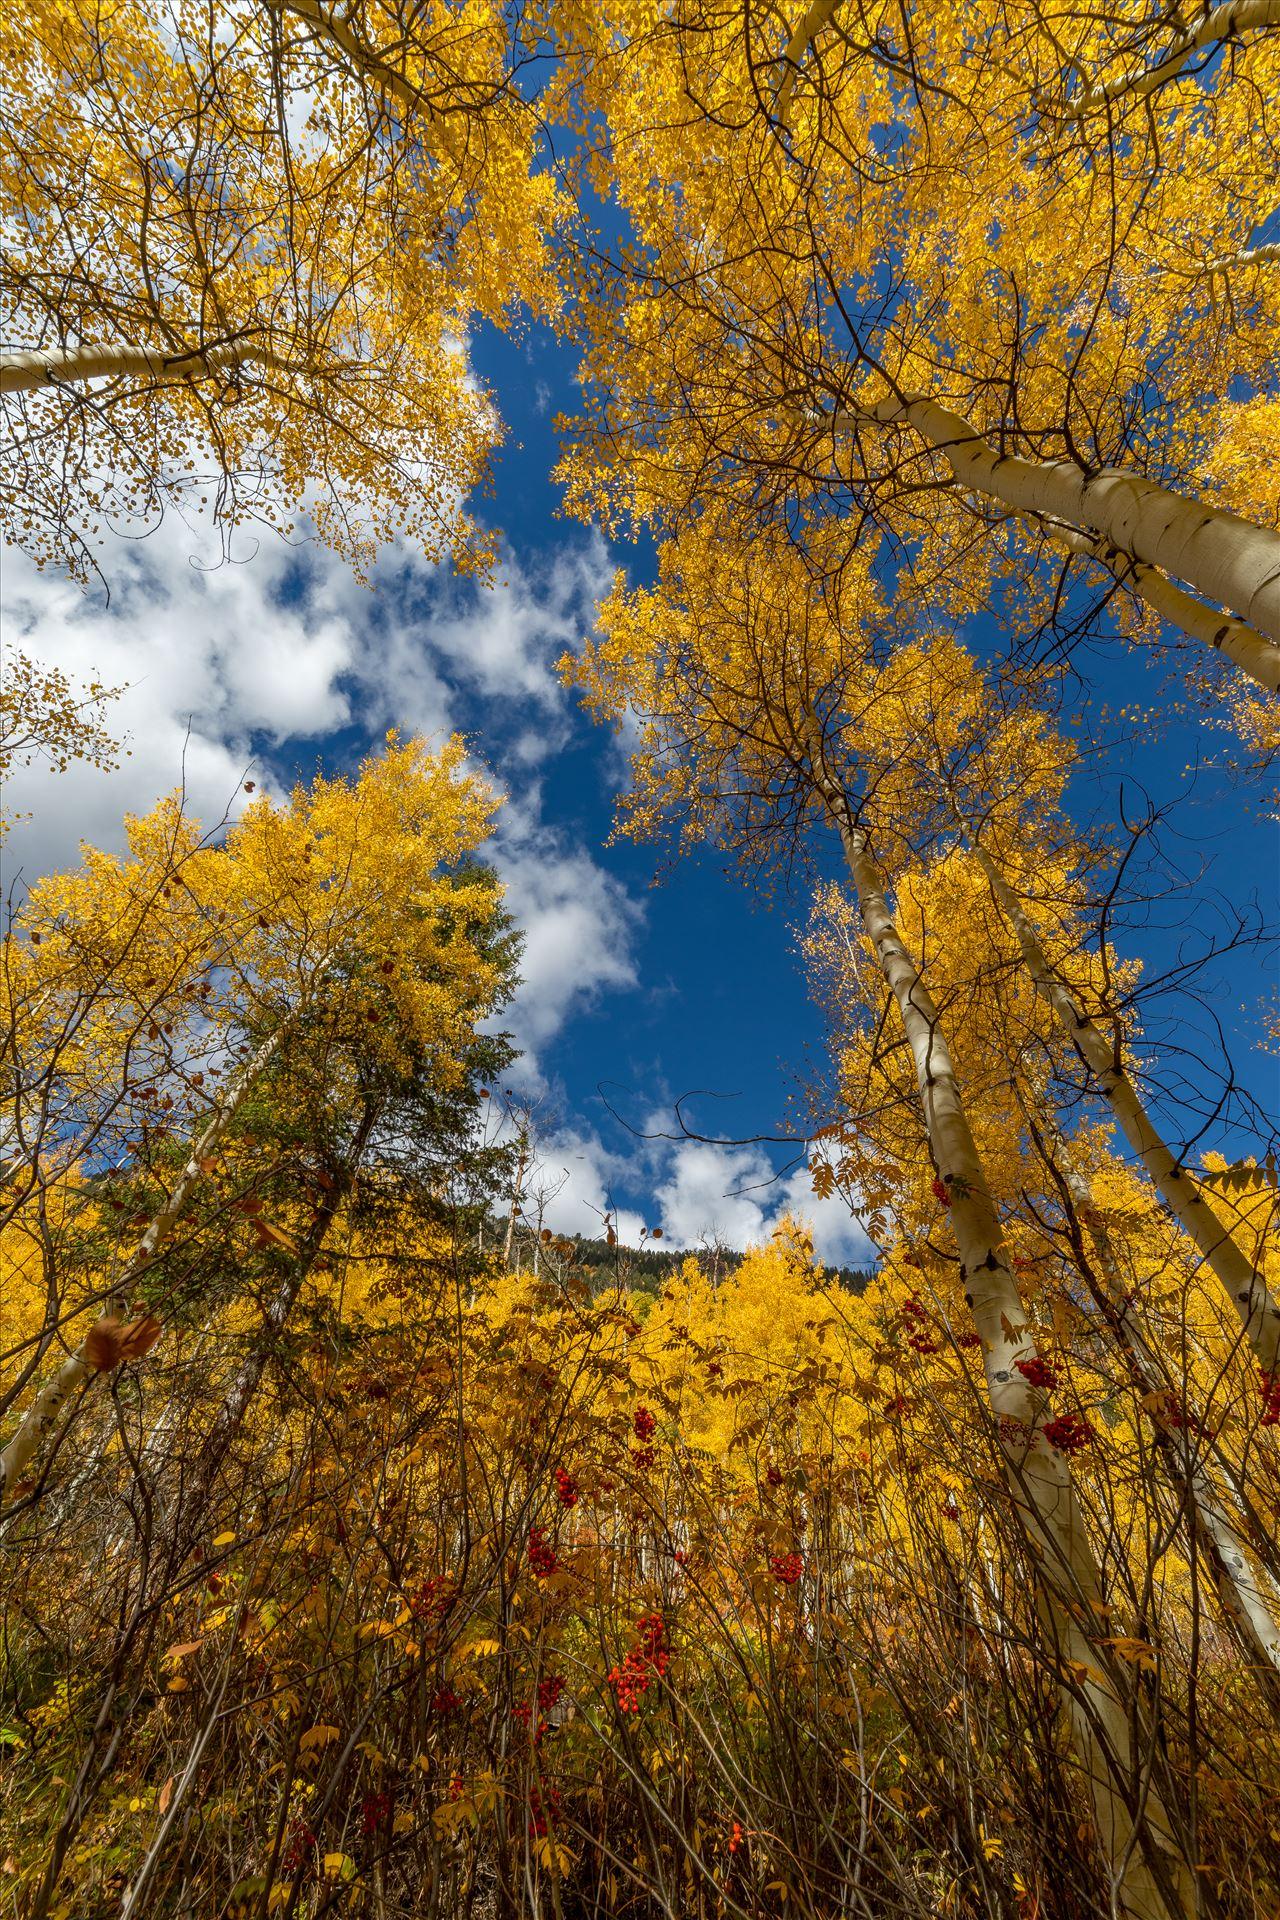 Aspens to the Sky No 2 Aspens and wild berries in Fall. Taken near Maroon Creek Drive near Aspen, Colorado. by Scott Smith Photos